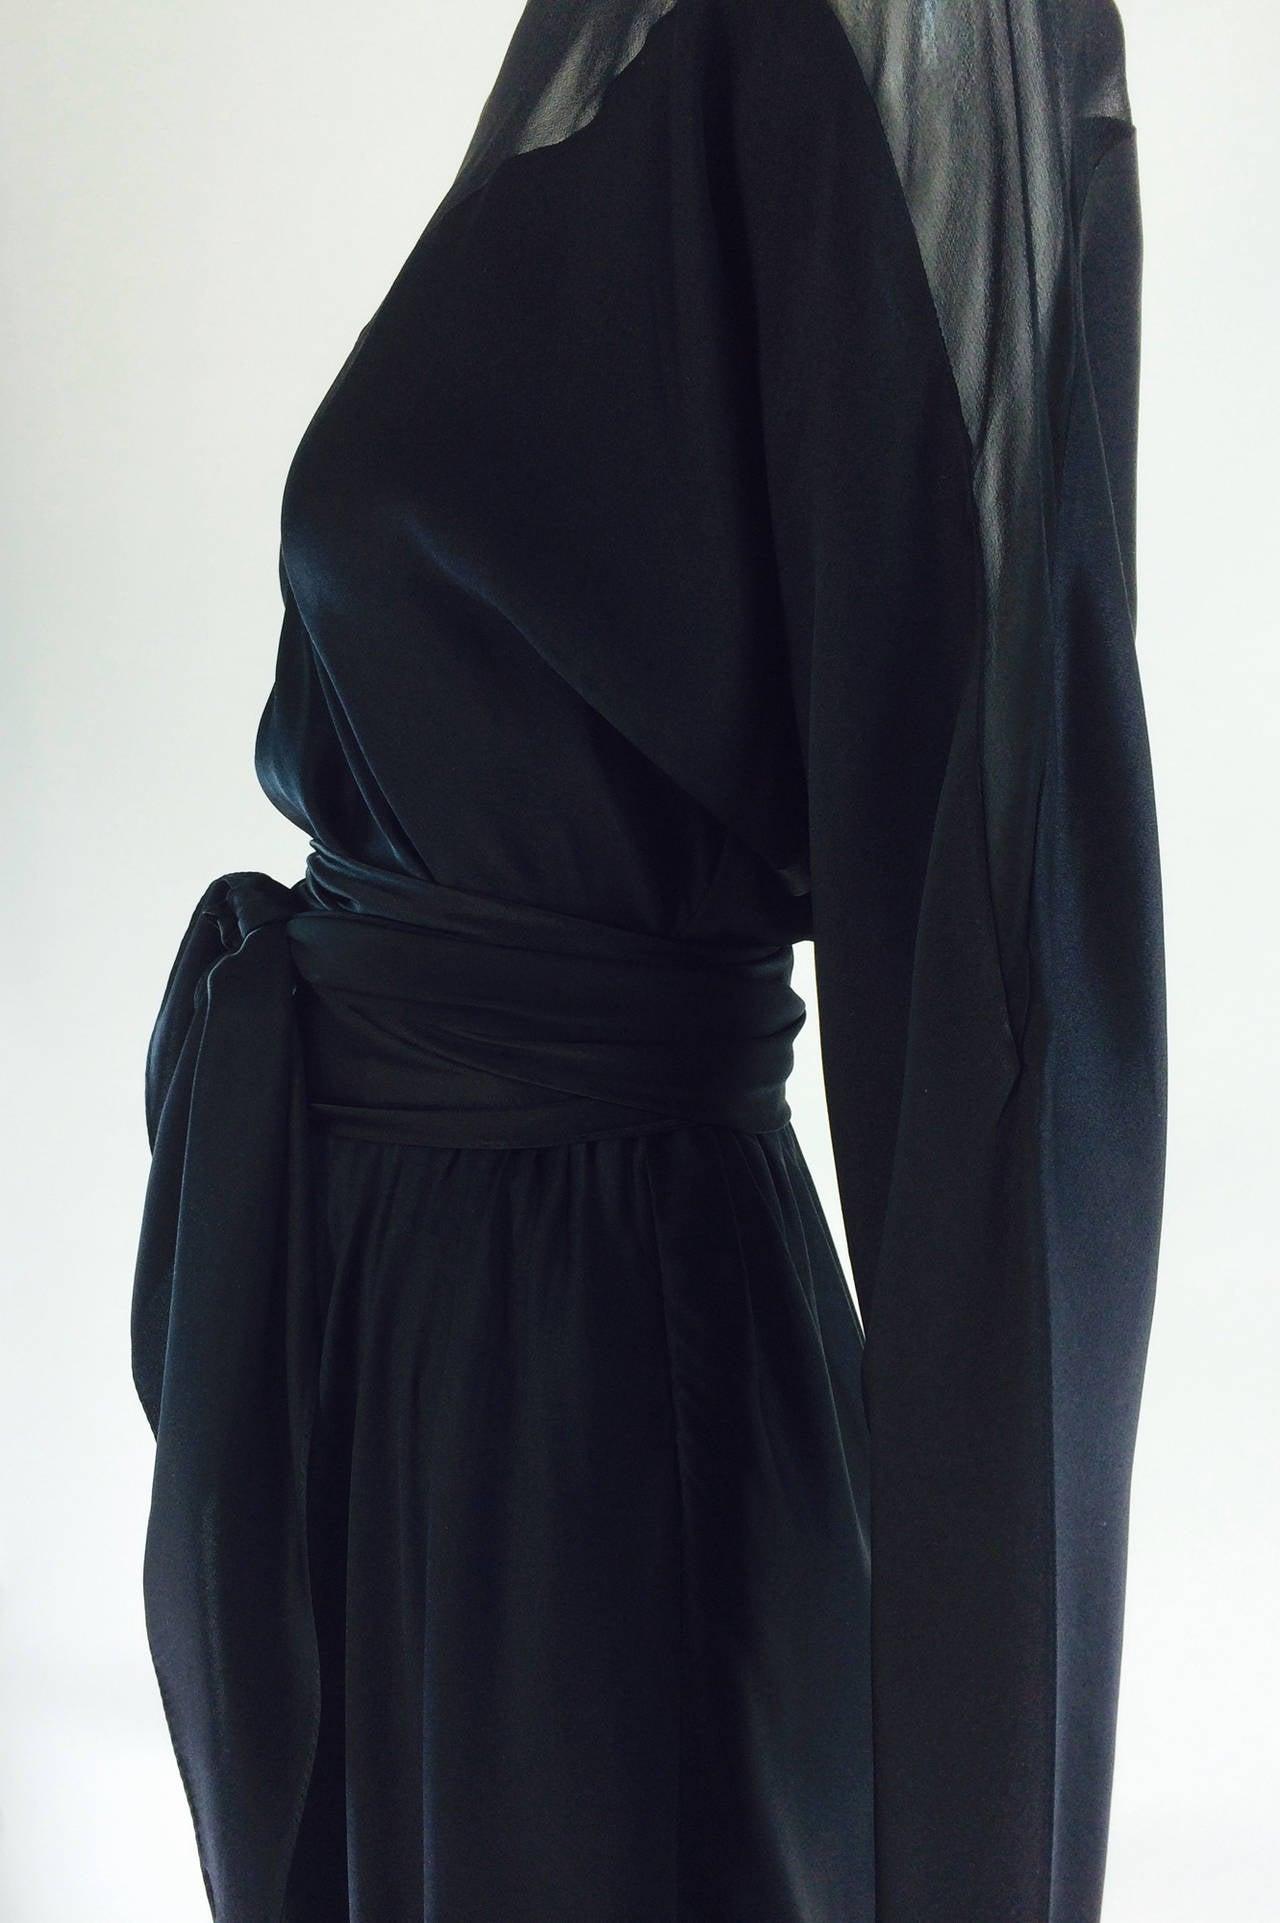 1970s Halston black silk chiffon & silk charmeuse bias cut cocktail dress For Sale 4